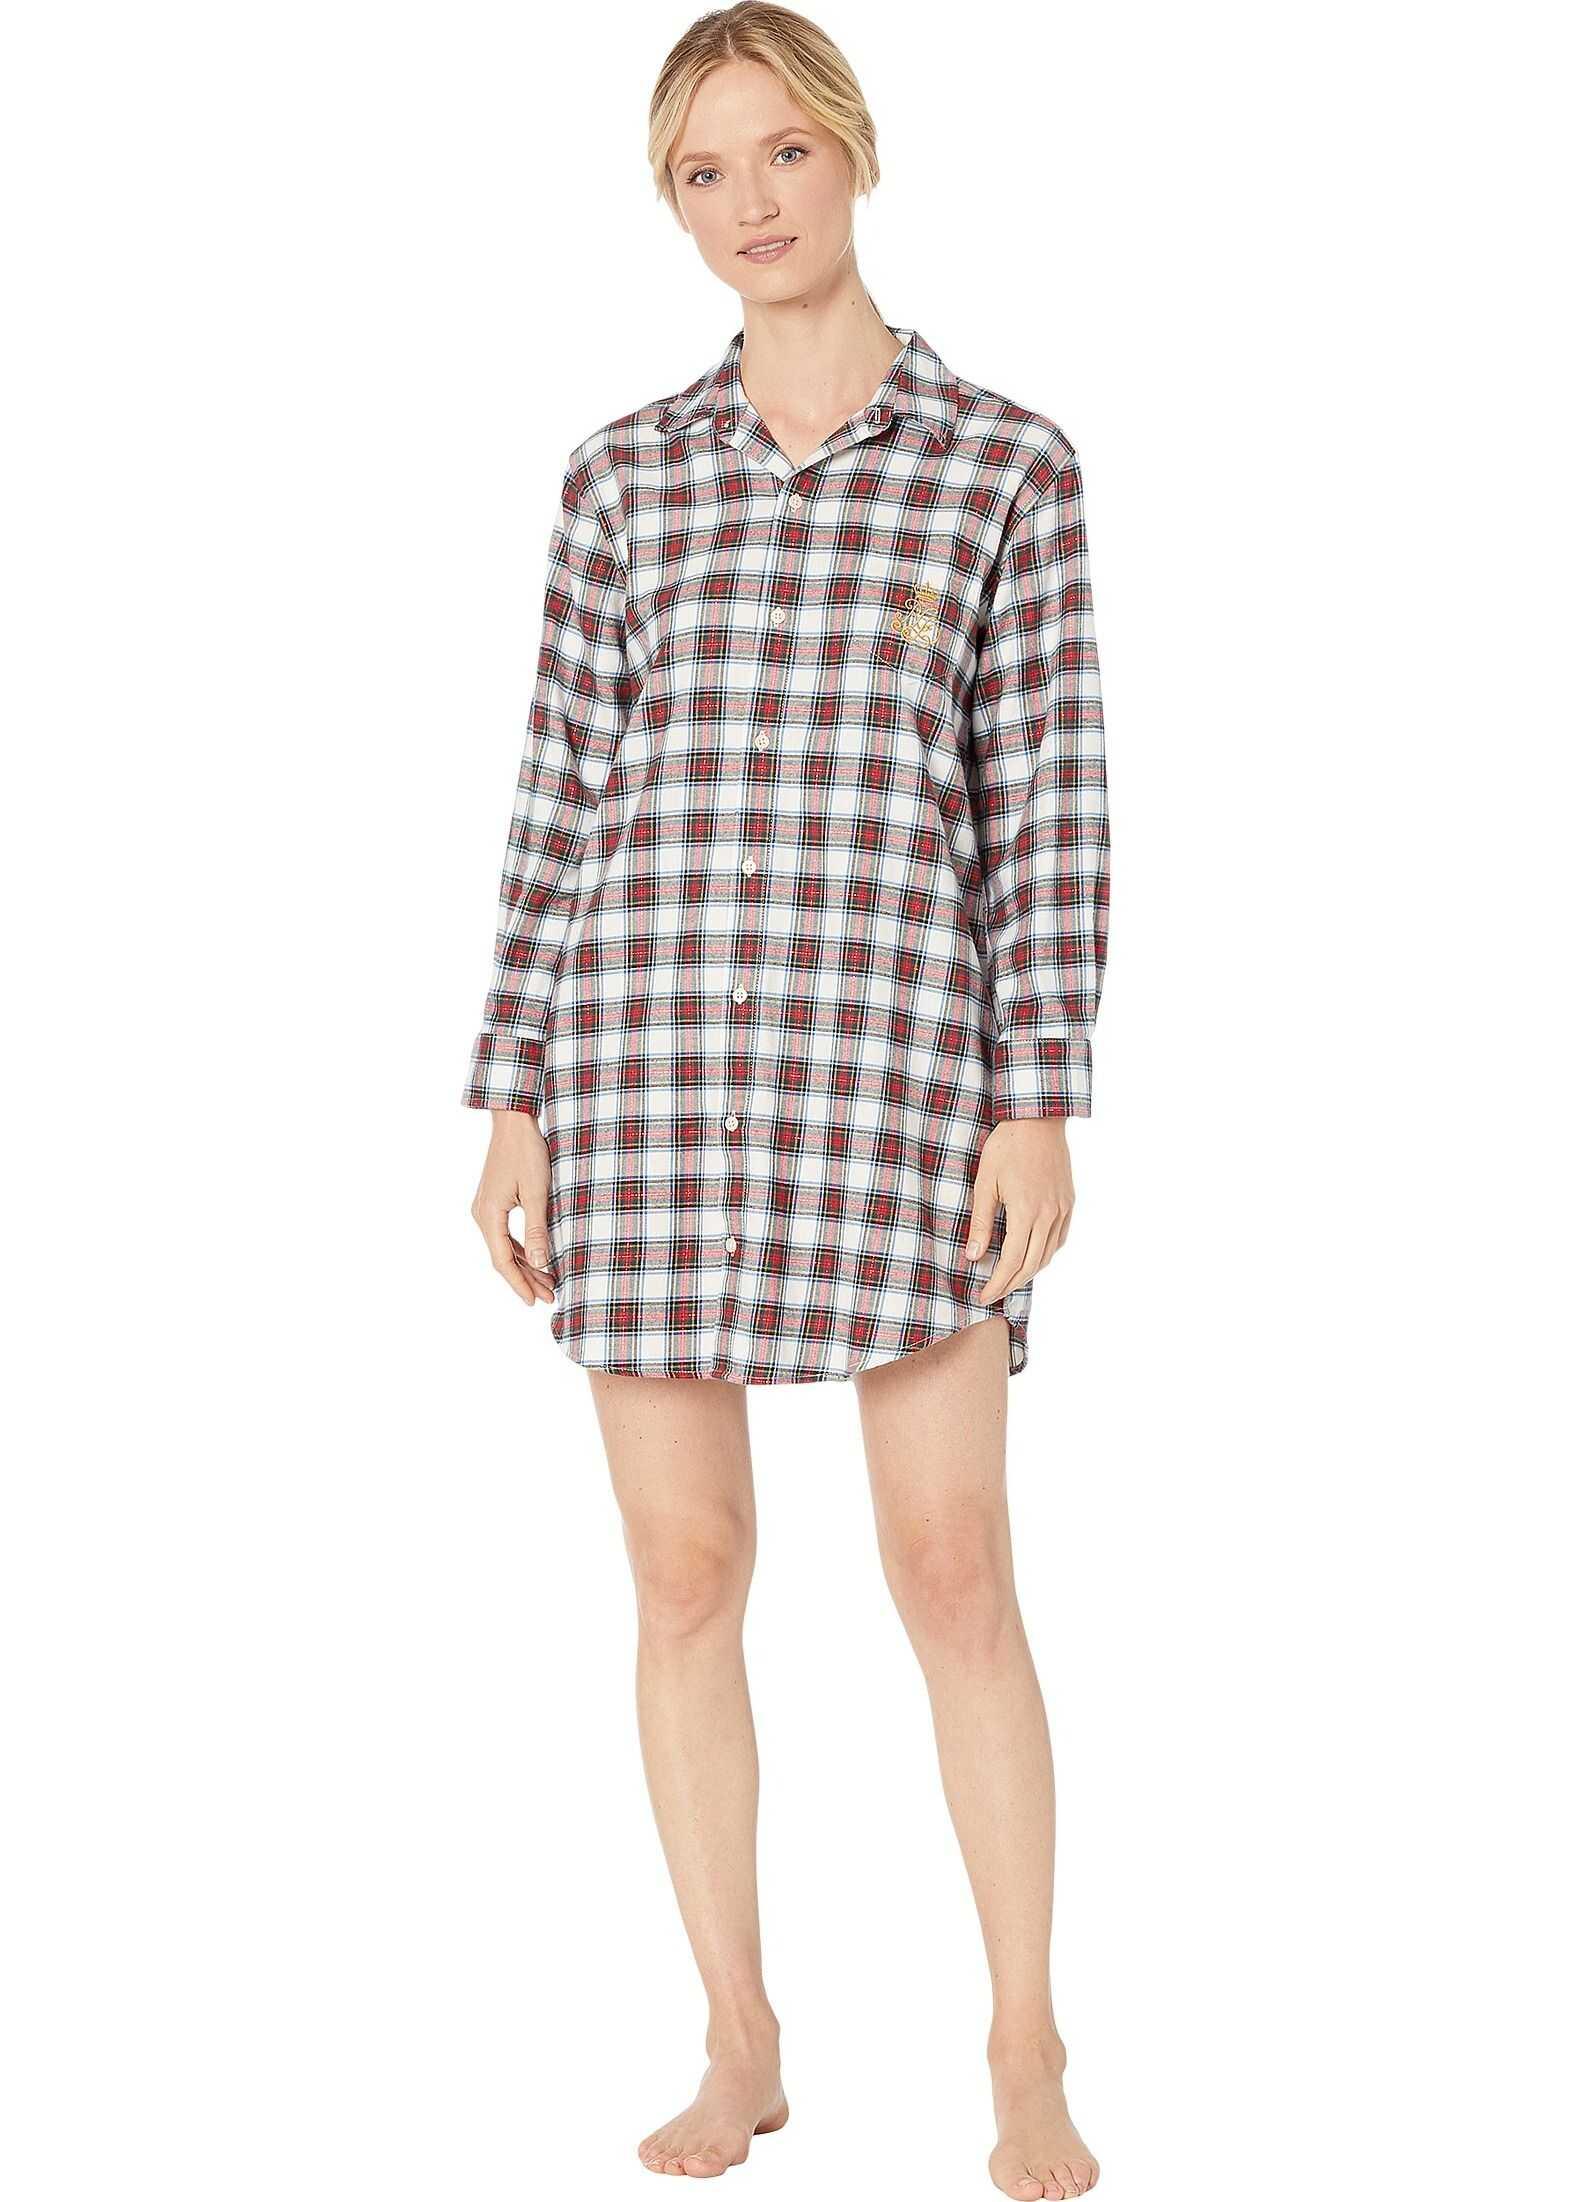 Ralph Lauren Brushed Twill Long Sleeve His Shirt Sleepshirt Ivory Plaid